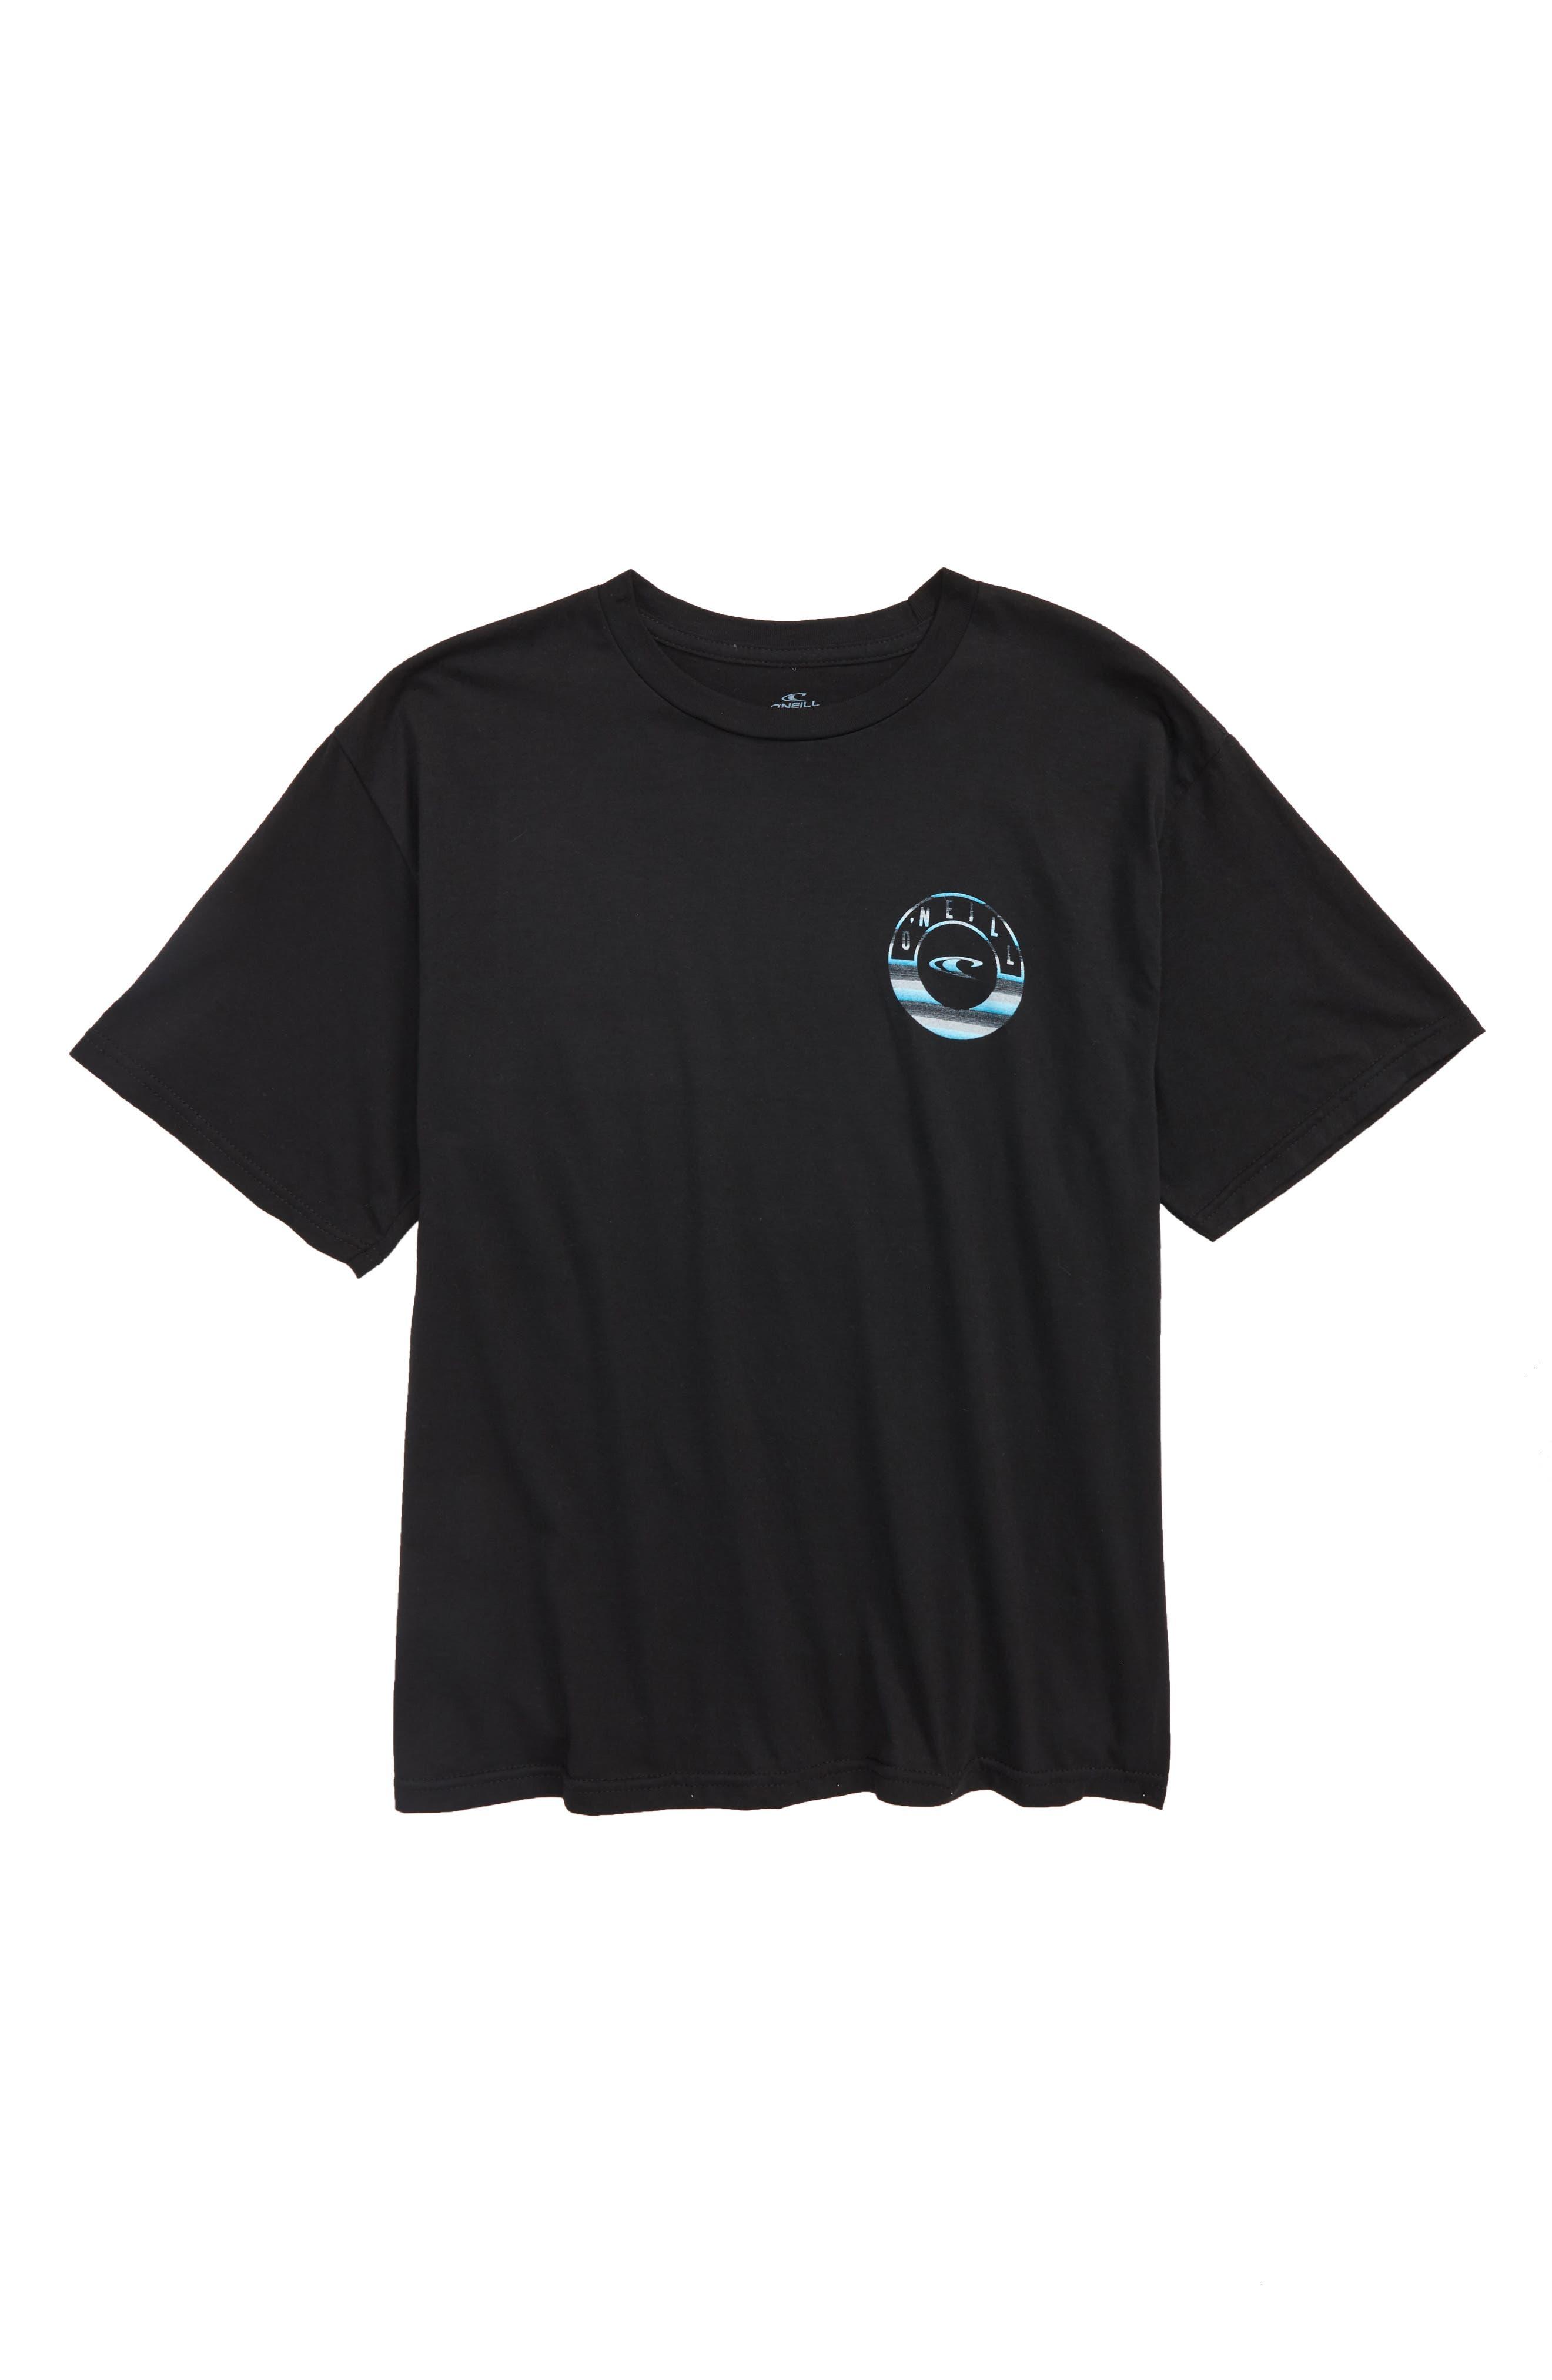 Alternate Image 1 Selected - O'Neill Fillmore Graphic T-Shirt (Big Boys)